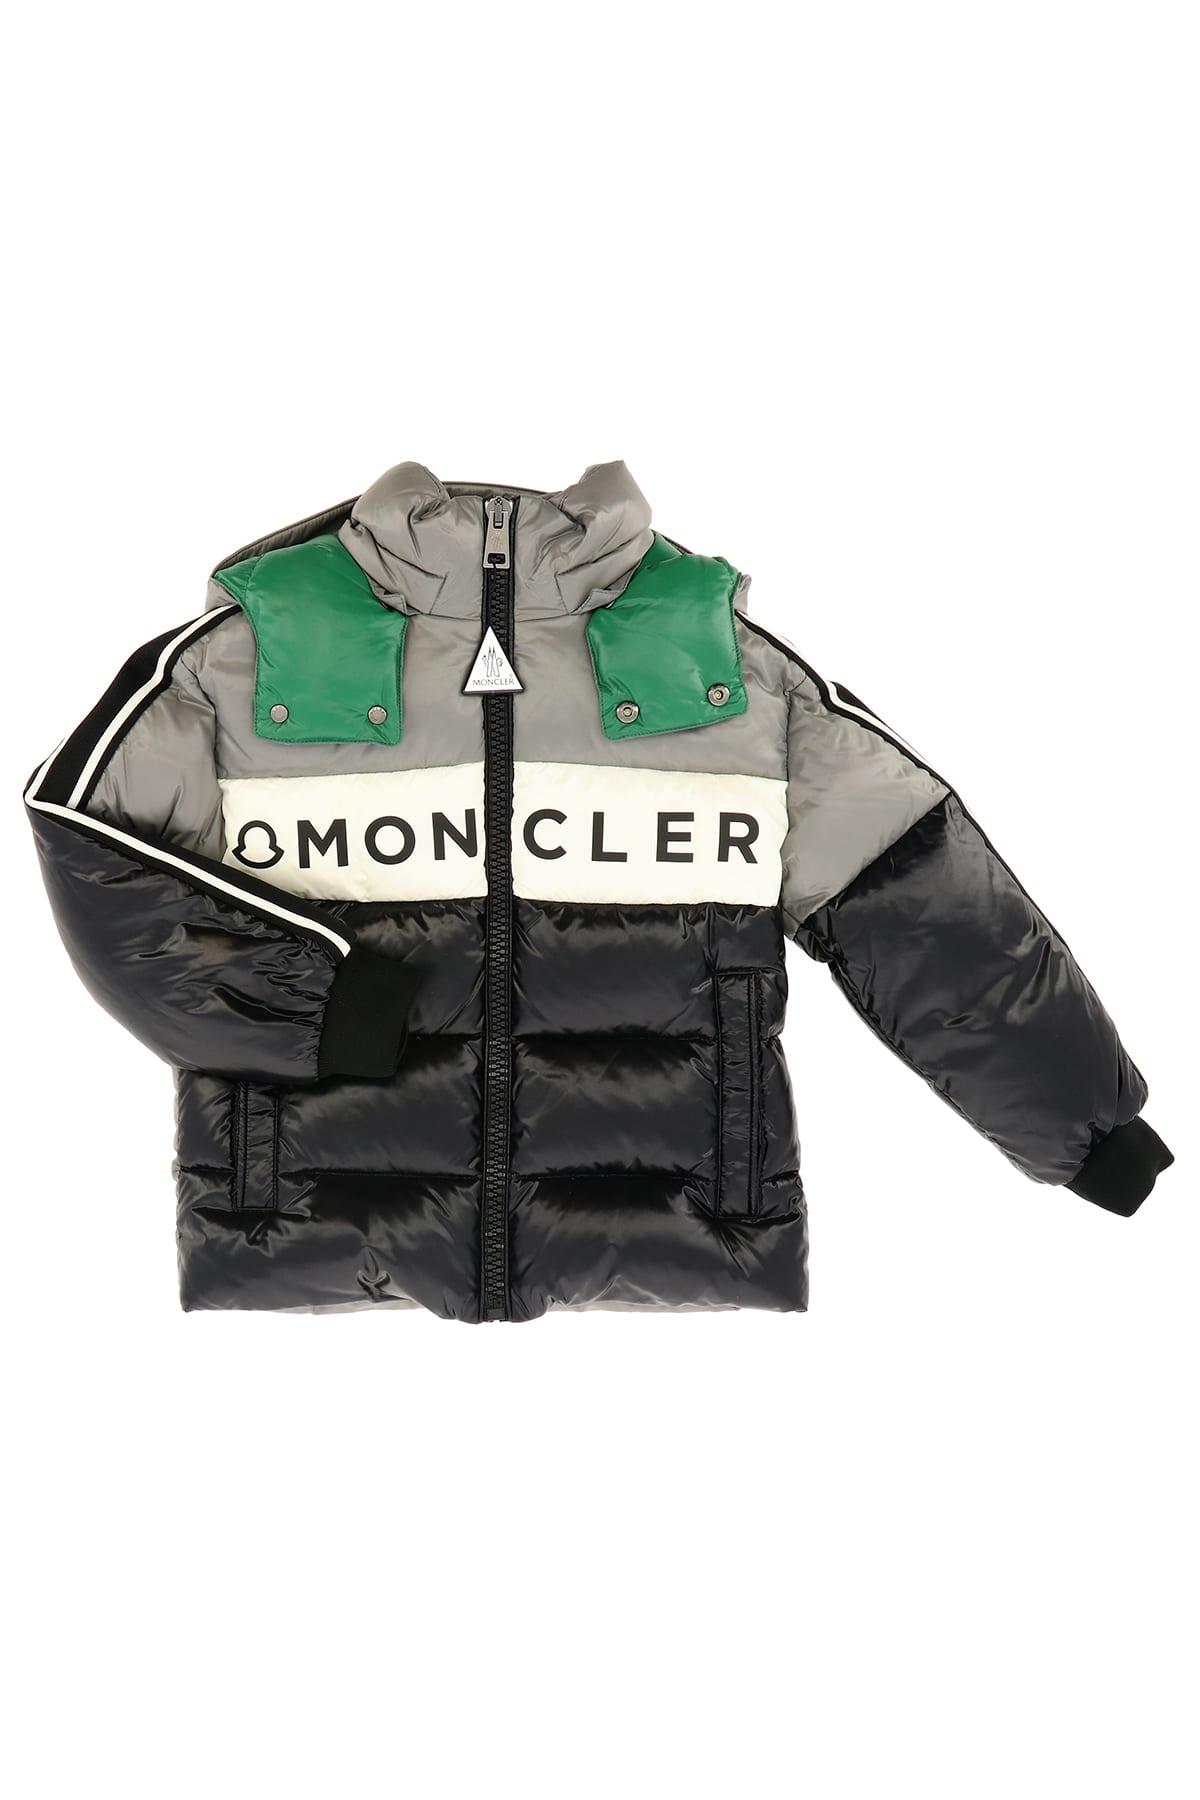 Moncler Kids' Febrege Dowjn Jacket In Grigio